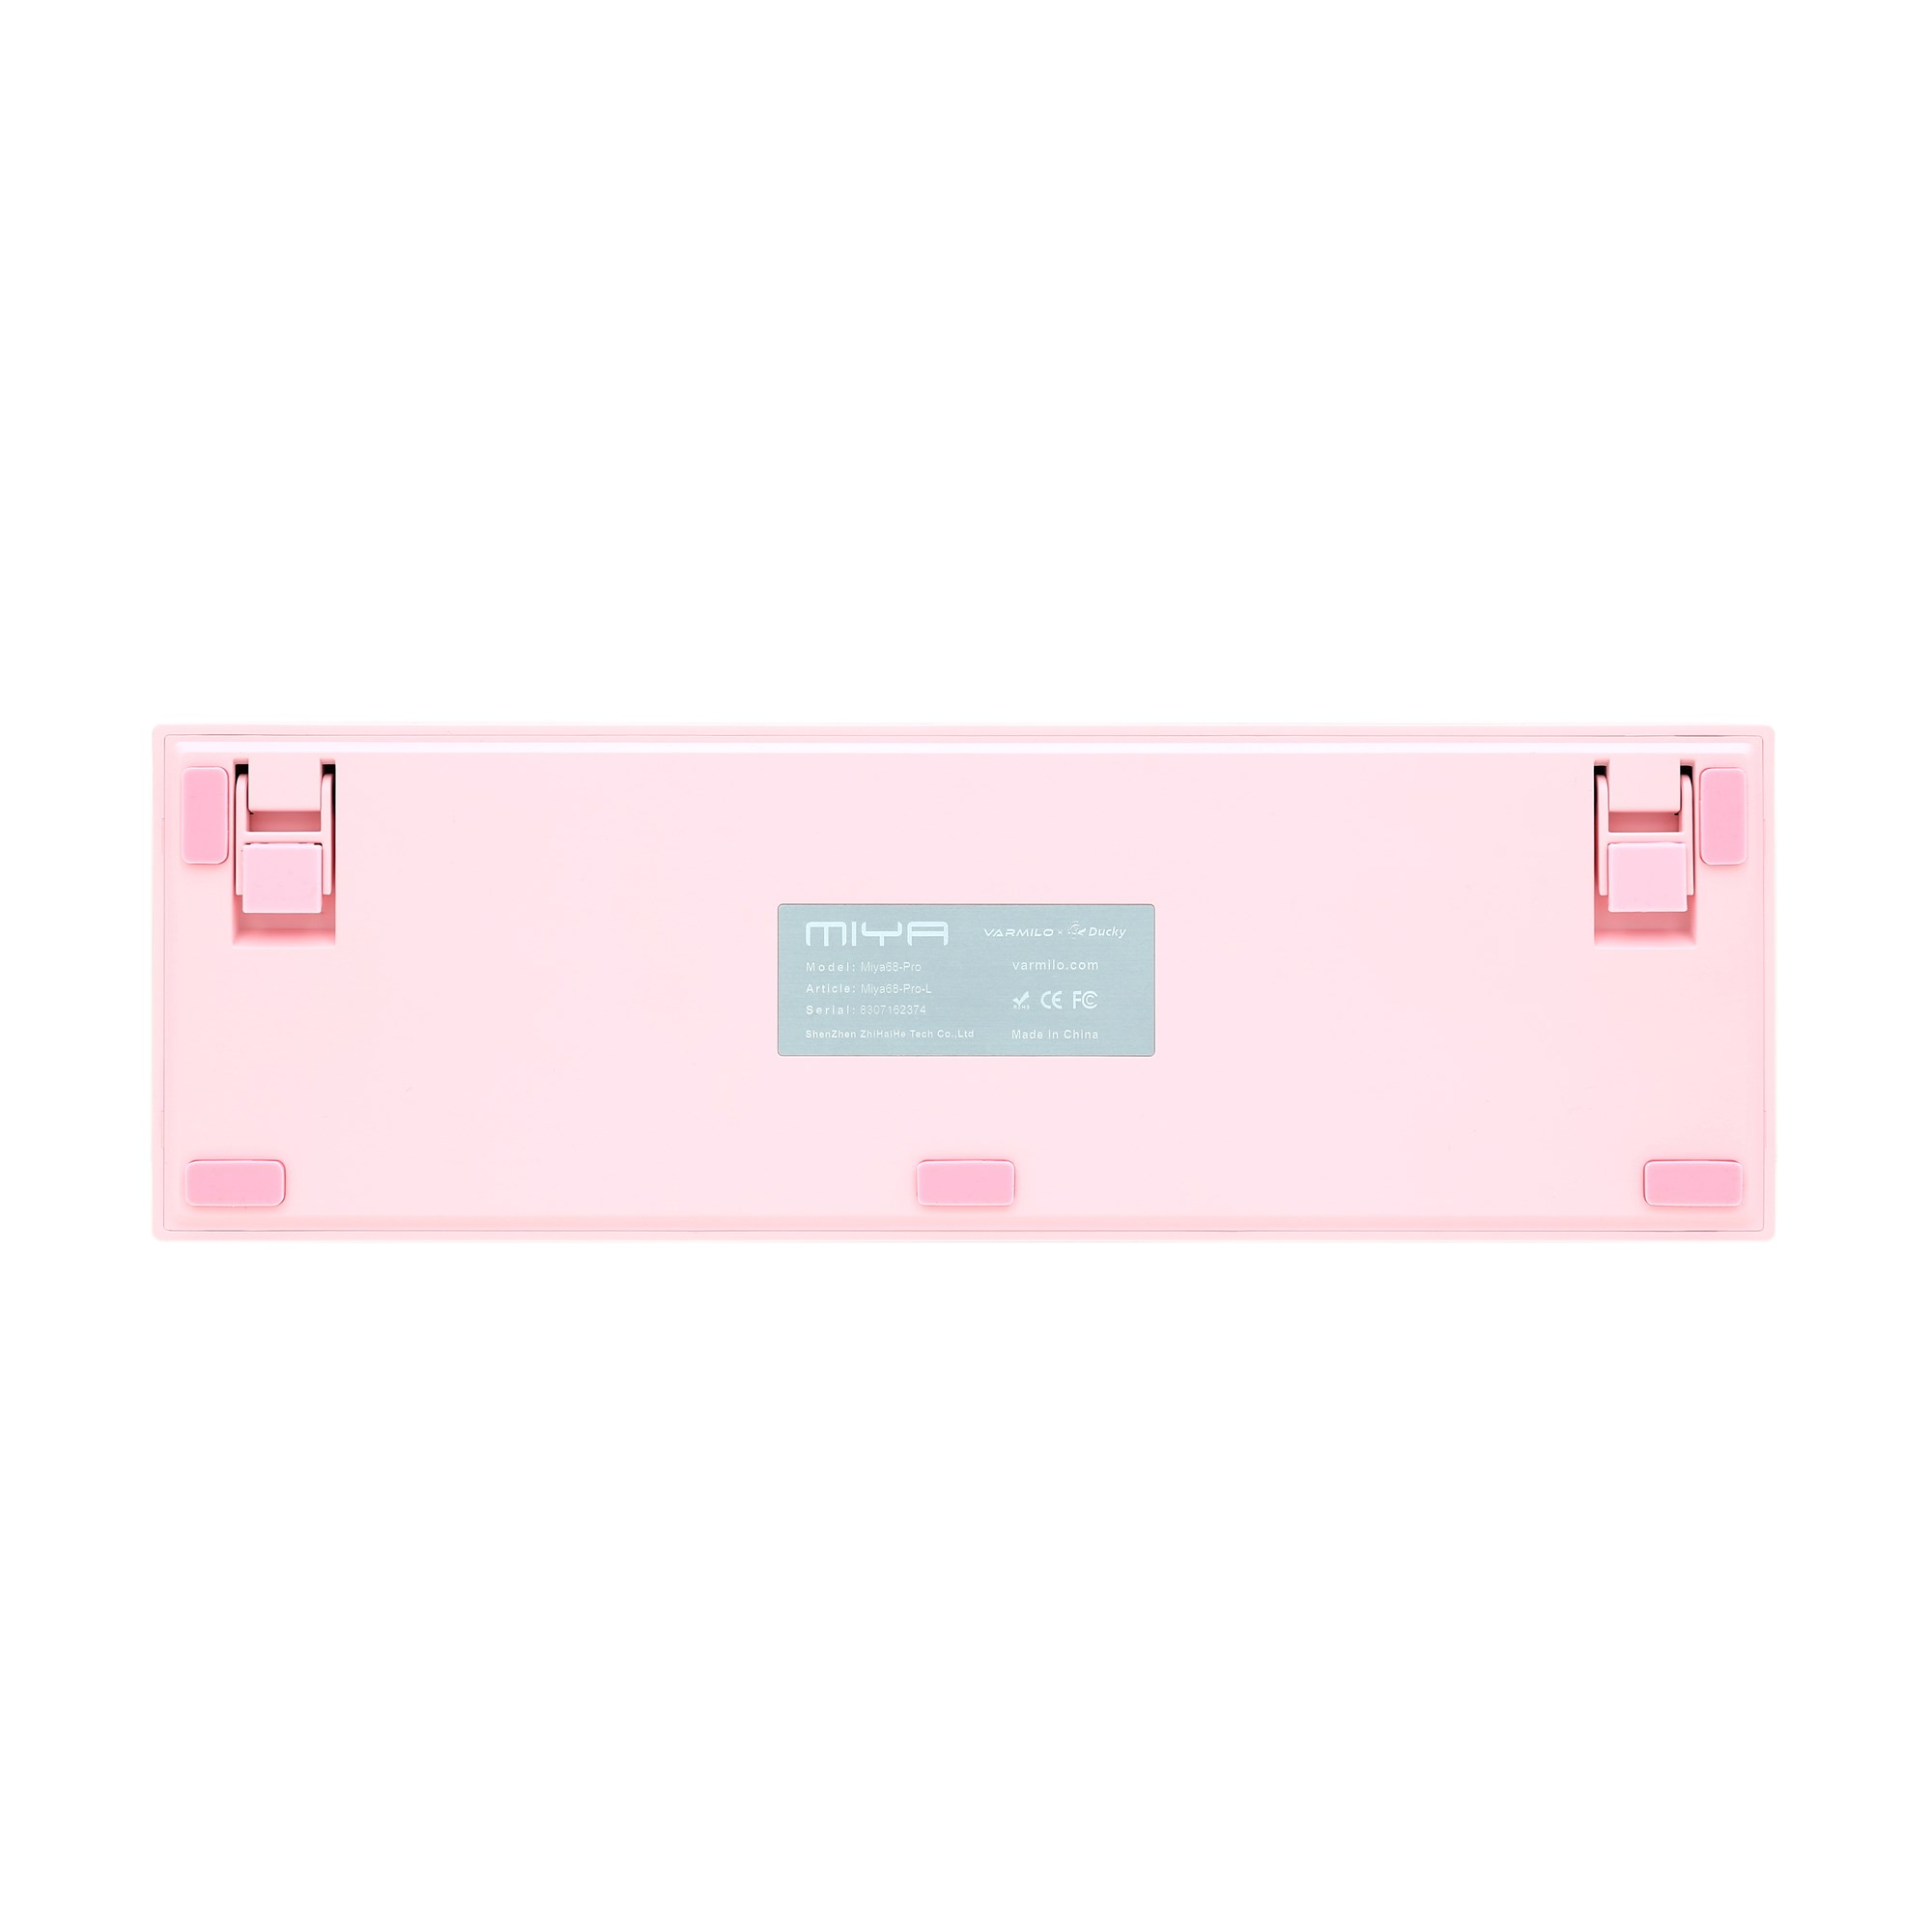 Ducky x Varmilo MIYA Pro Sakura Edition Mechanical Keyboard with Cherry MX  Red Switches (UK)